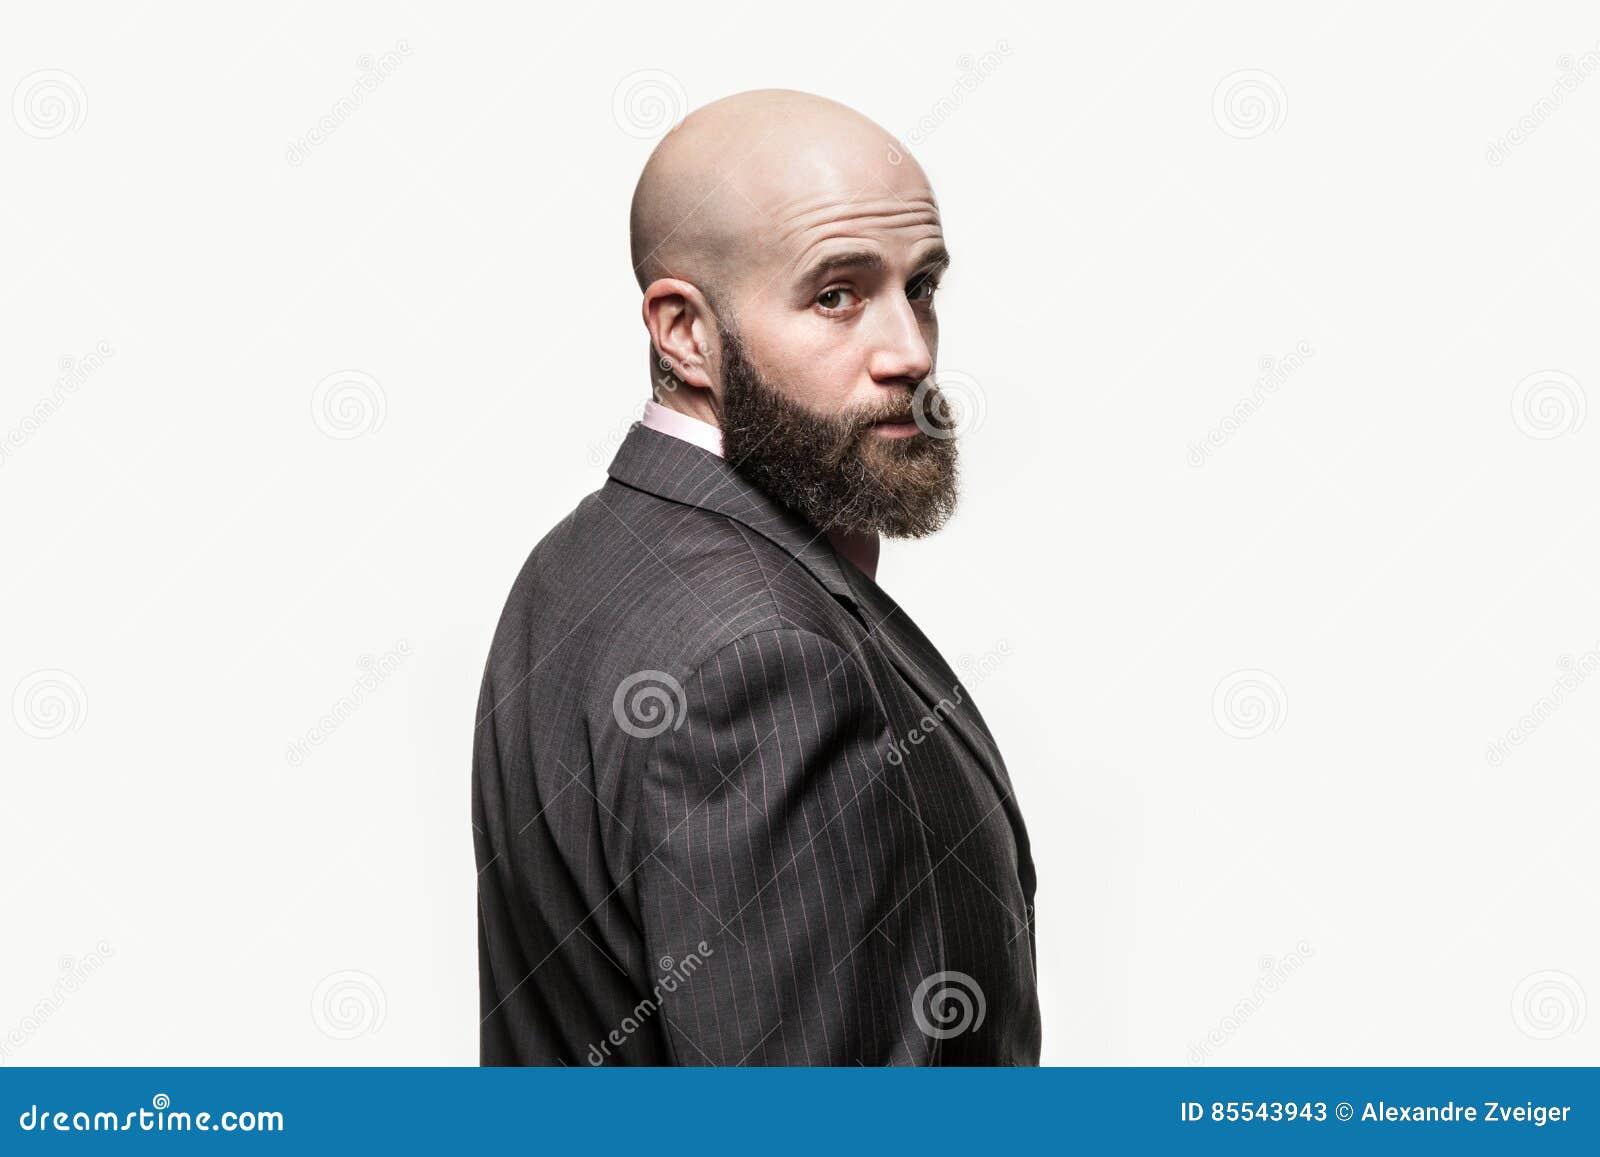 669 437 Beard Photos Free Royalty Free Stock Photos From Dreamstime